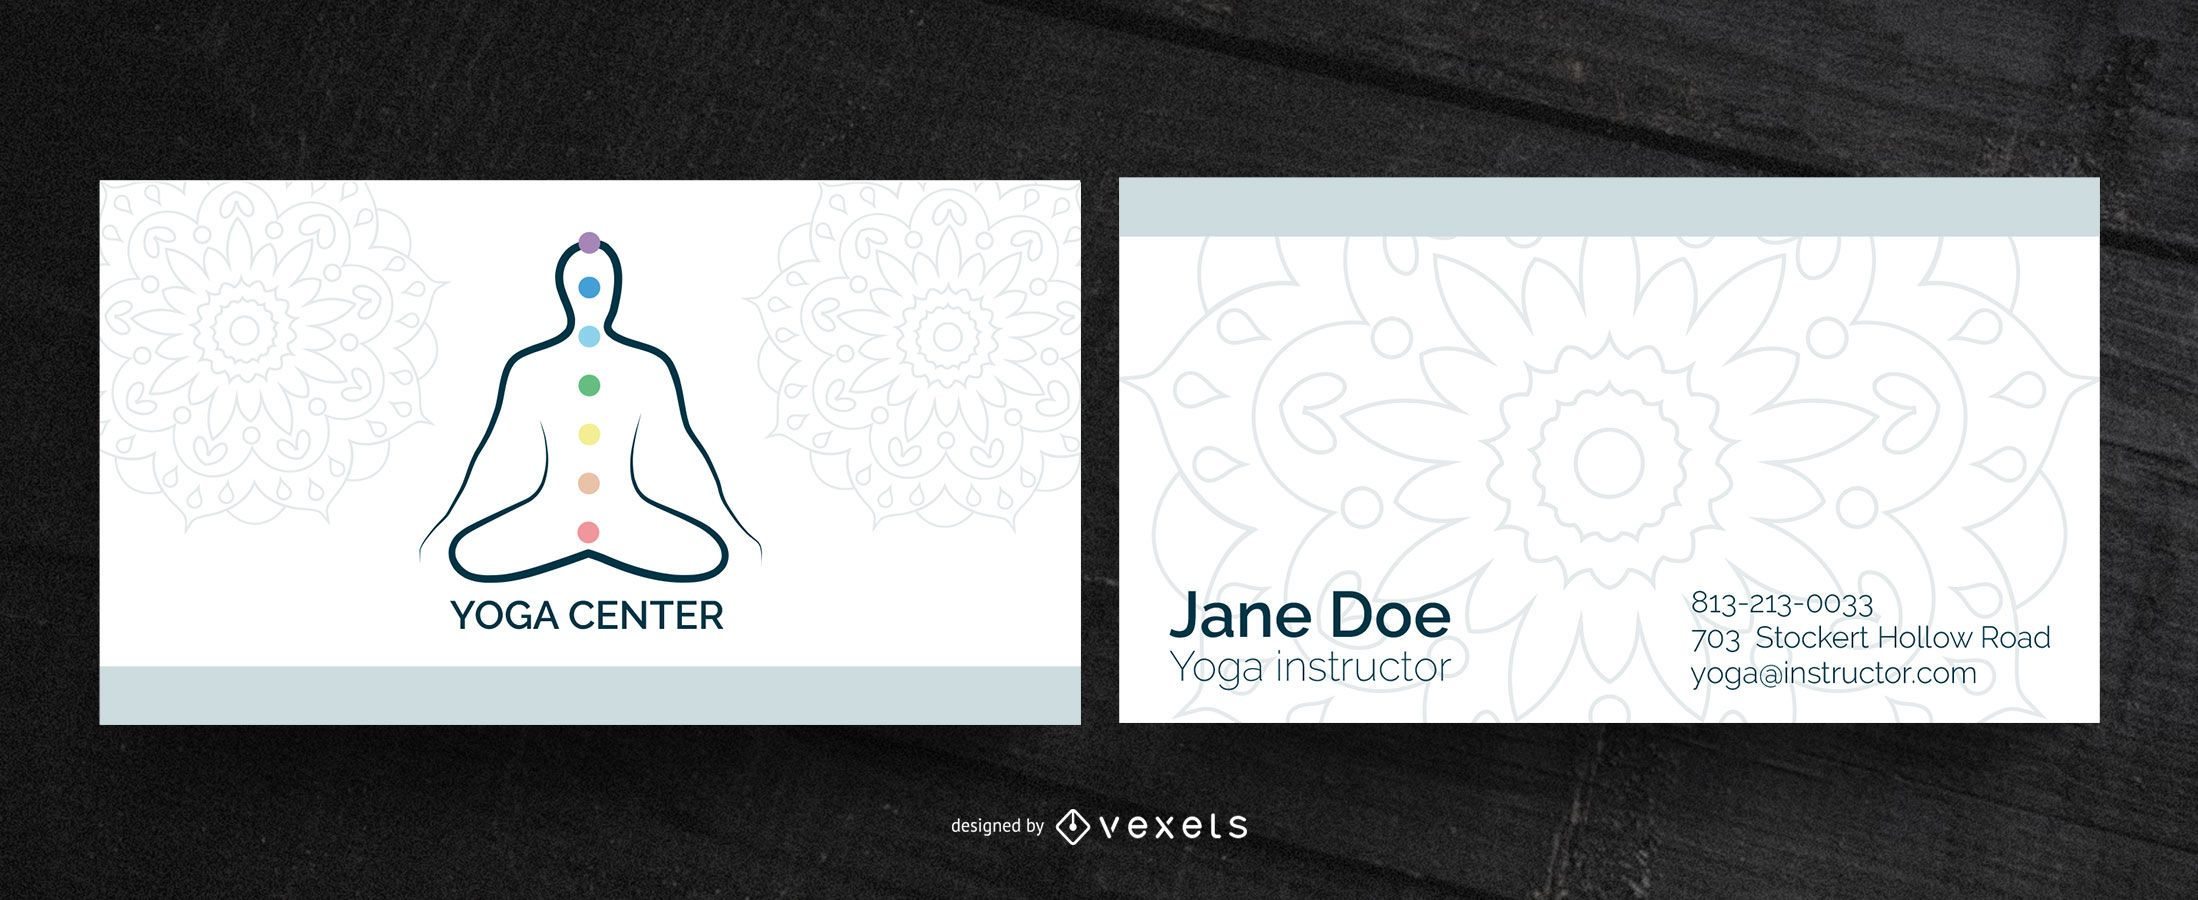 Visitenkarte des Yoga-Zentrums